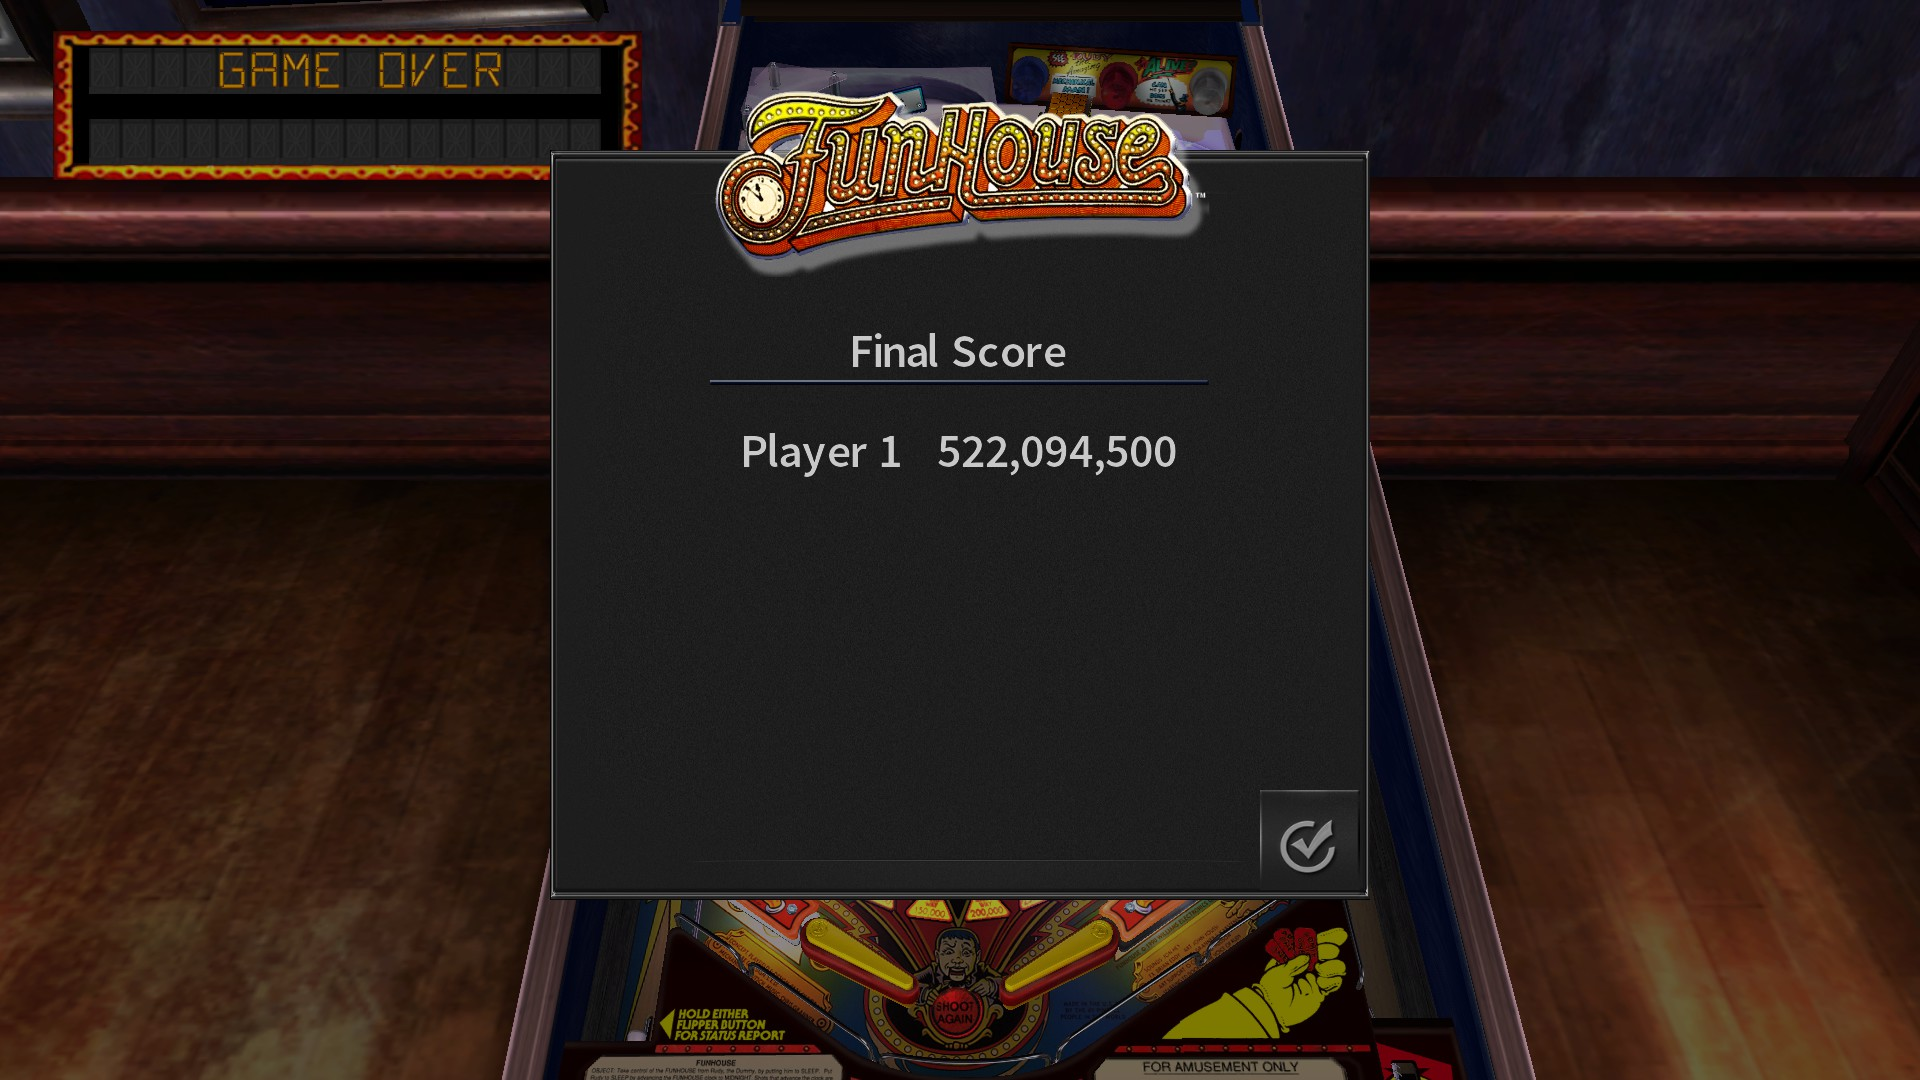 Pinball Arcade: Funhouse 522,094,500 points